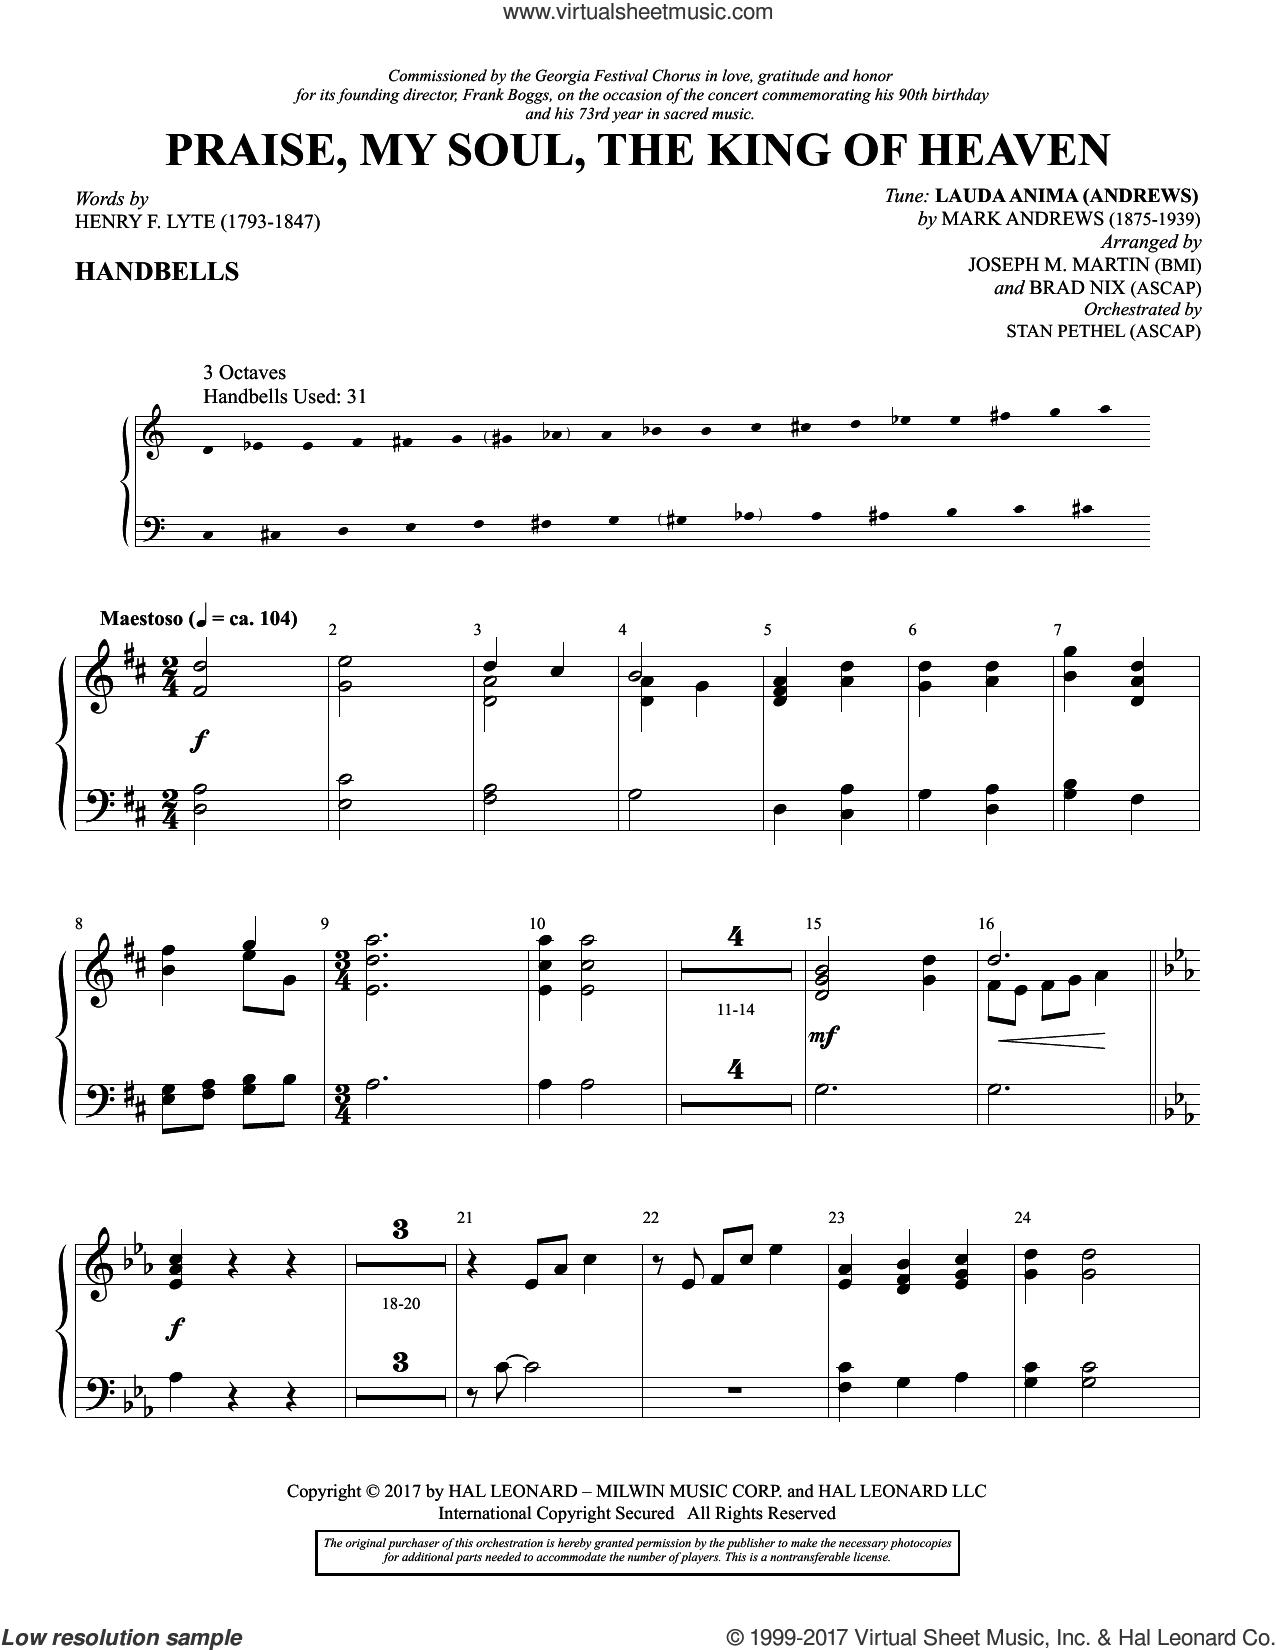 Praise, My Soul, the King of Heaven sheet music for orchestra/band (handbells) by Henry F. Lyte, Joseph M. Martin, Brad Nix, John Goss and Mark Andrews, intermediate skill level